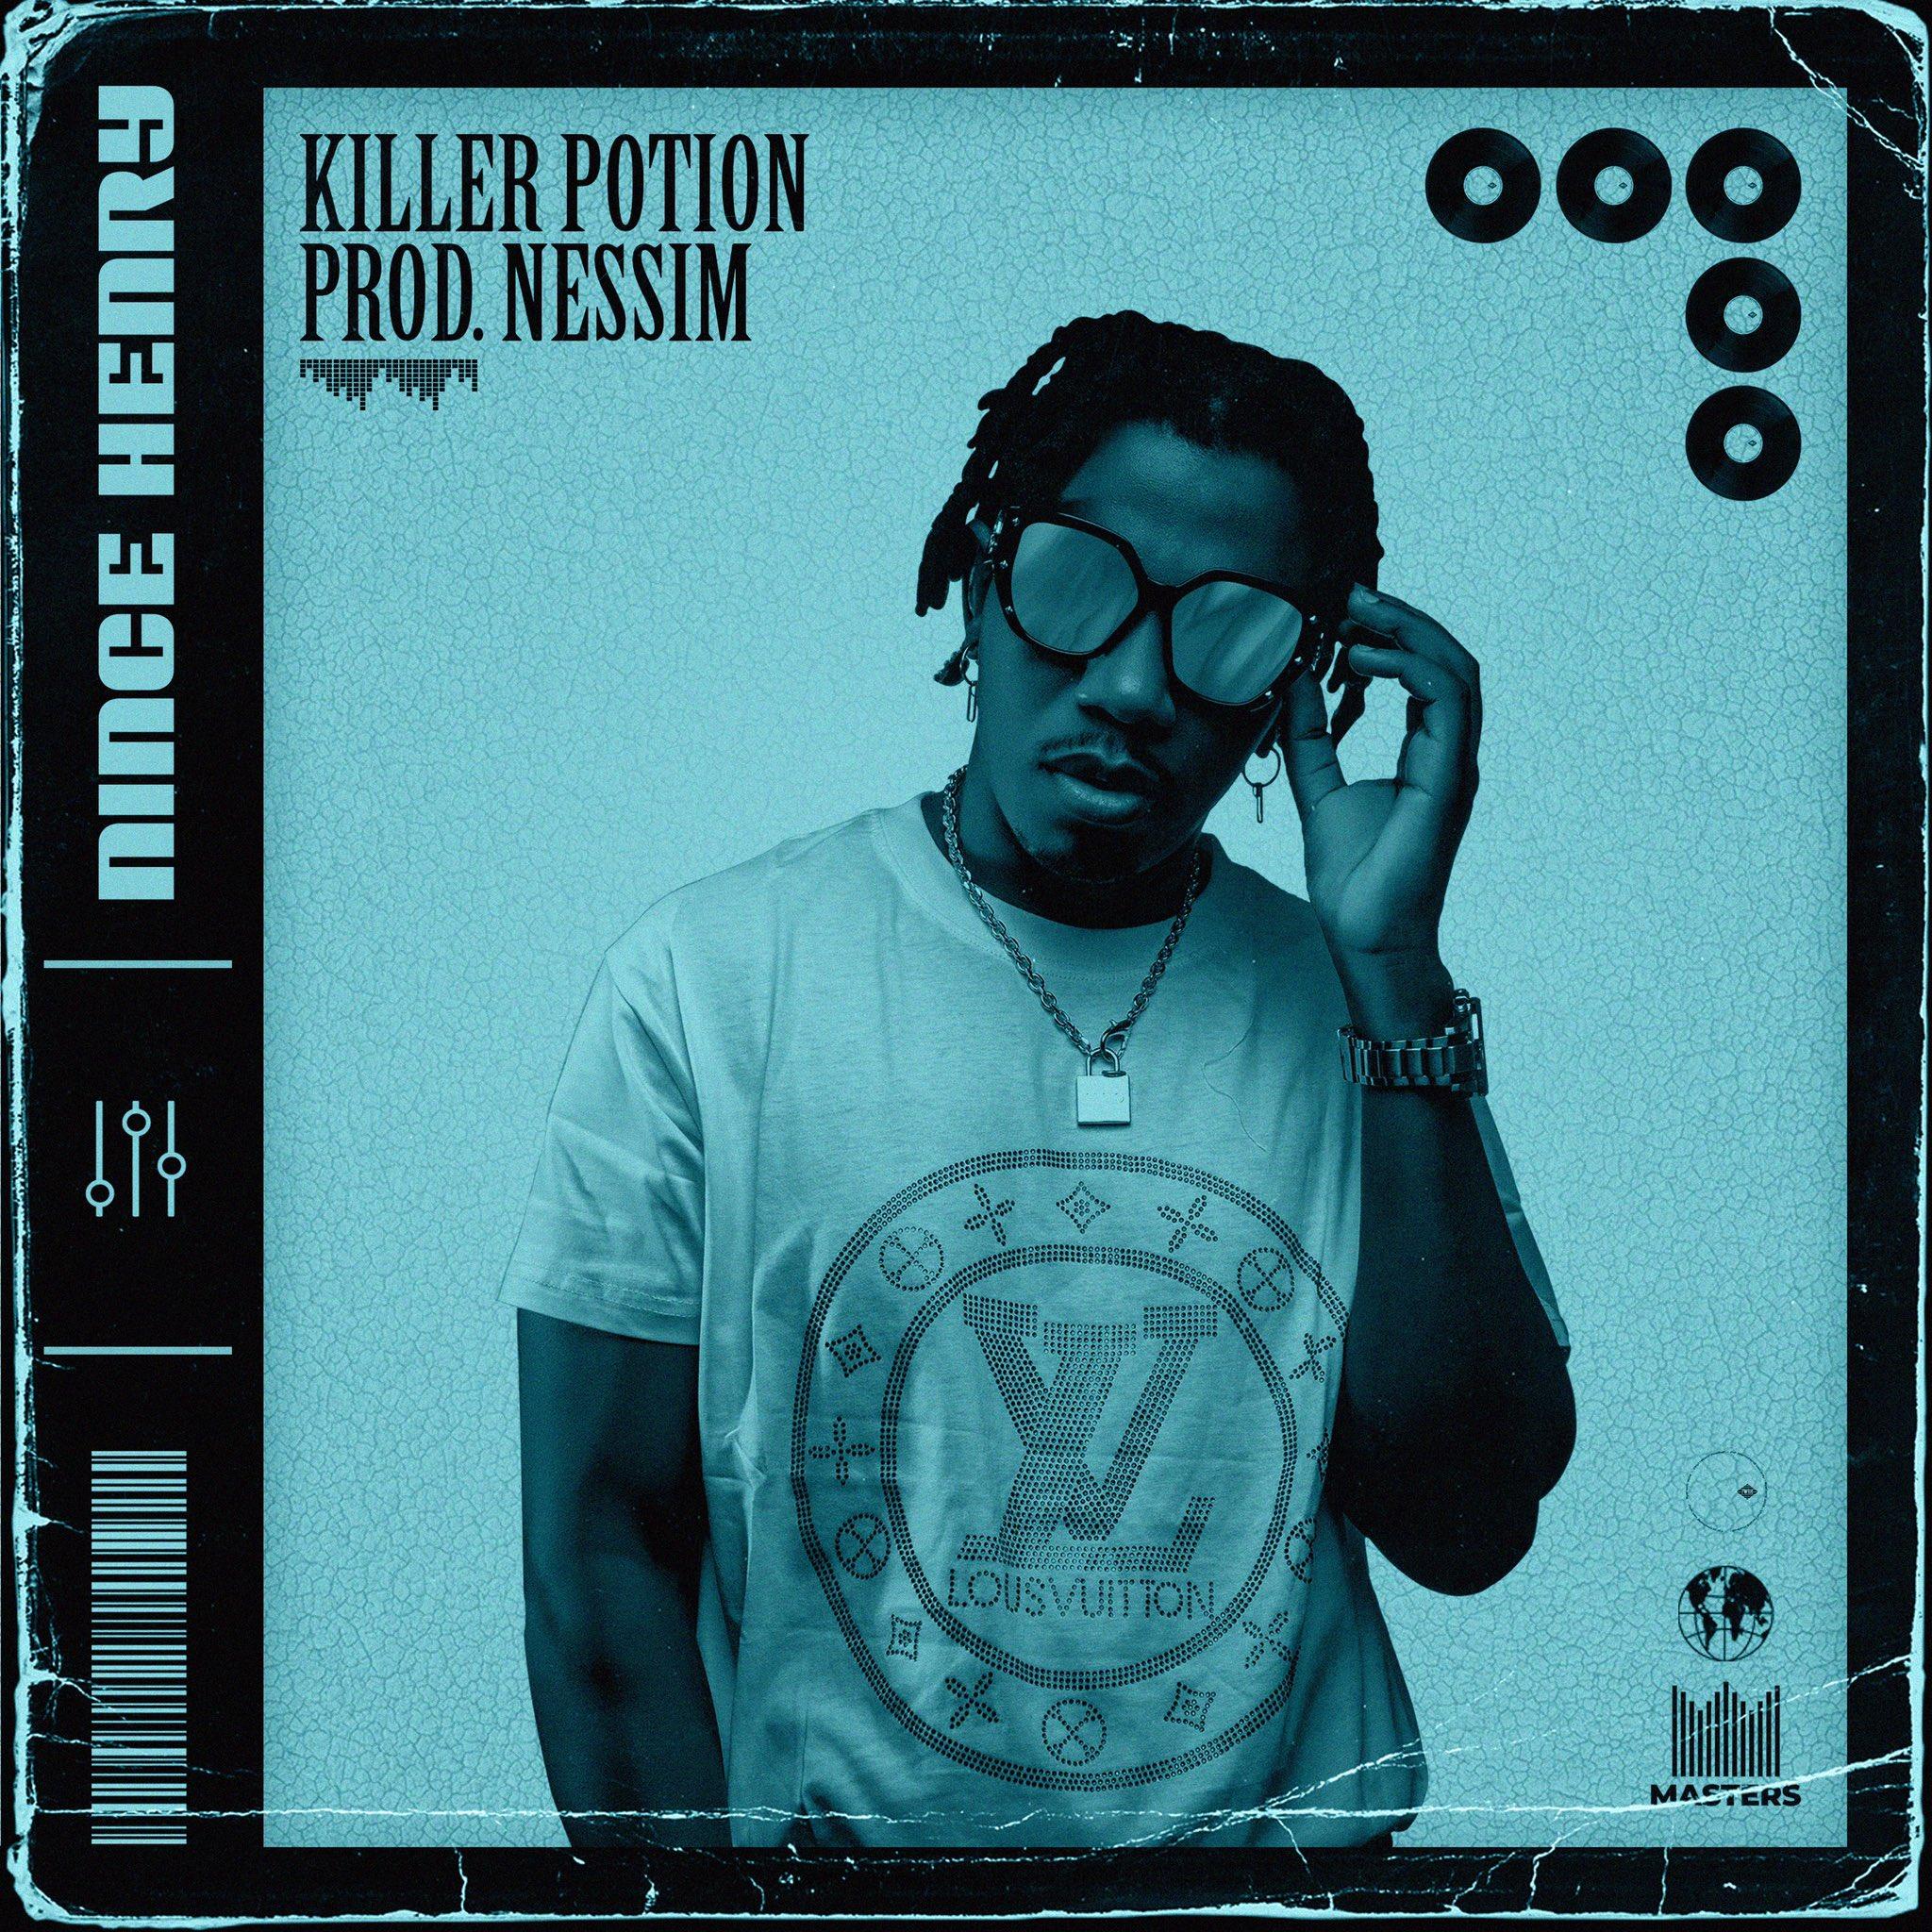 'Killer Potion' song artwork (Picture: Nince Henry, Twitter)